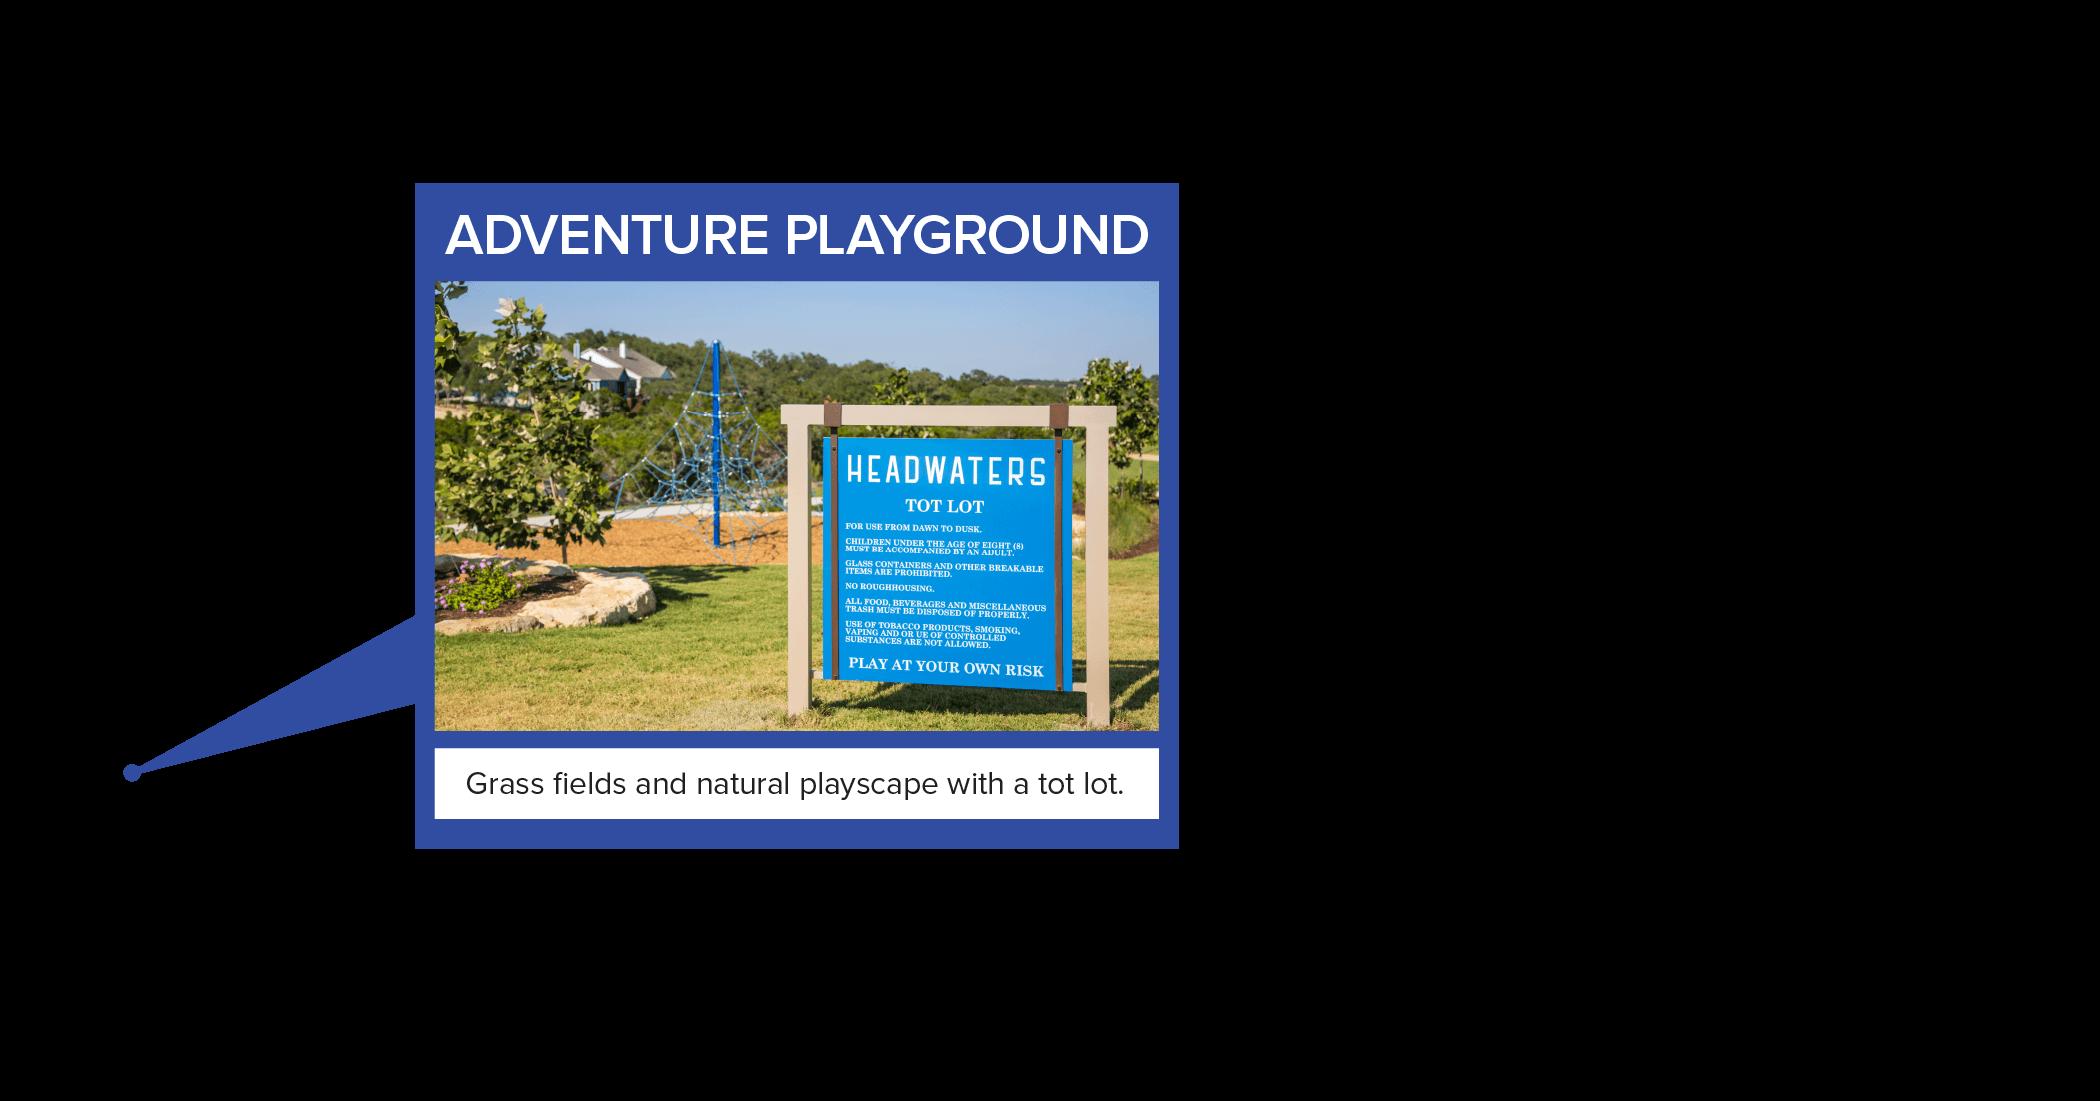 Photo of Headwaters Adventure Playground